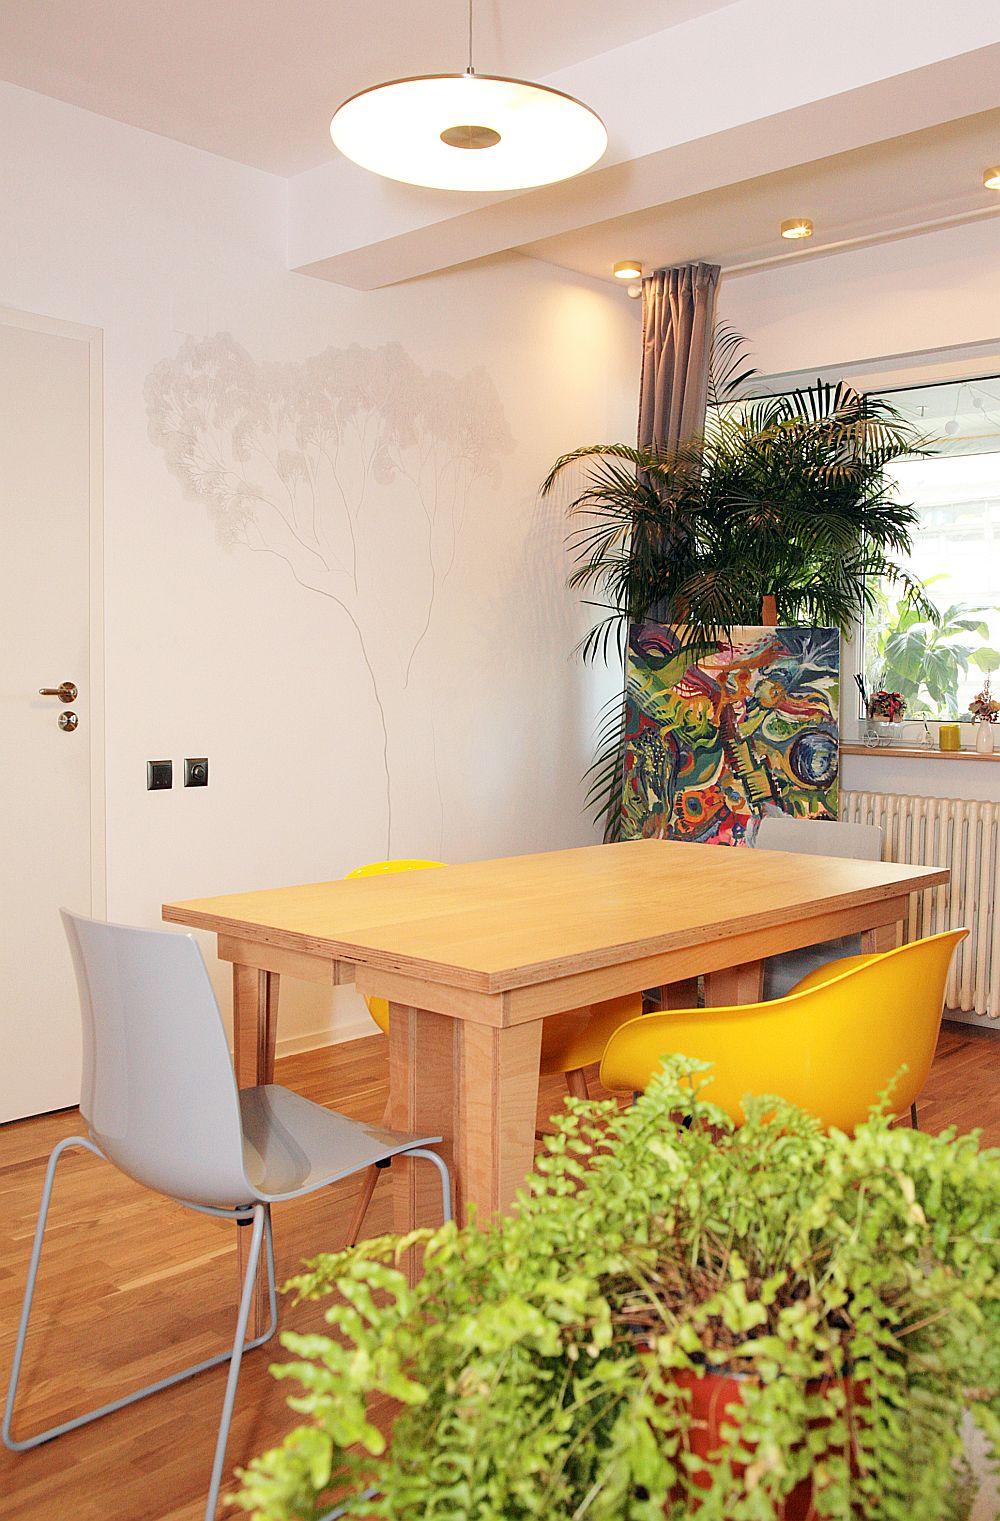 adelaparvu.com despre apartament de doua camere in Bucuresti ingenios amenajat, design ValDecor, Foto Alia Bakutayan (20)